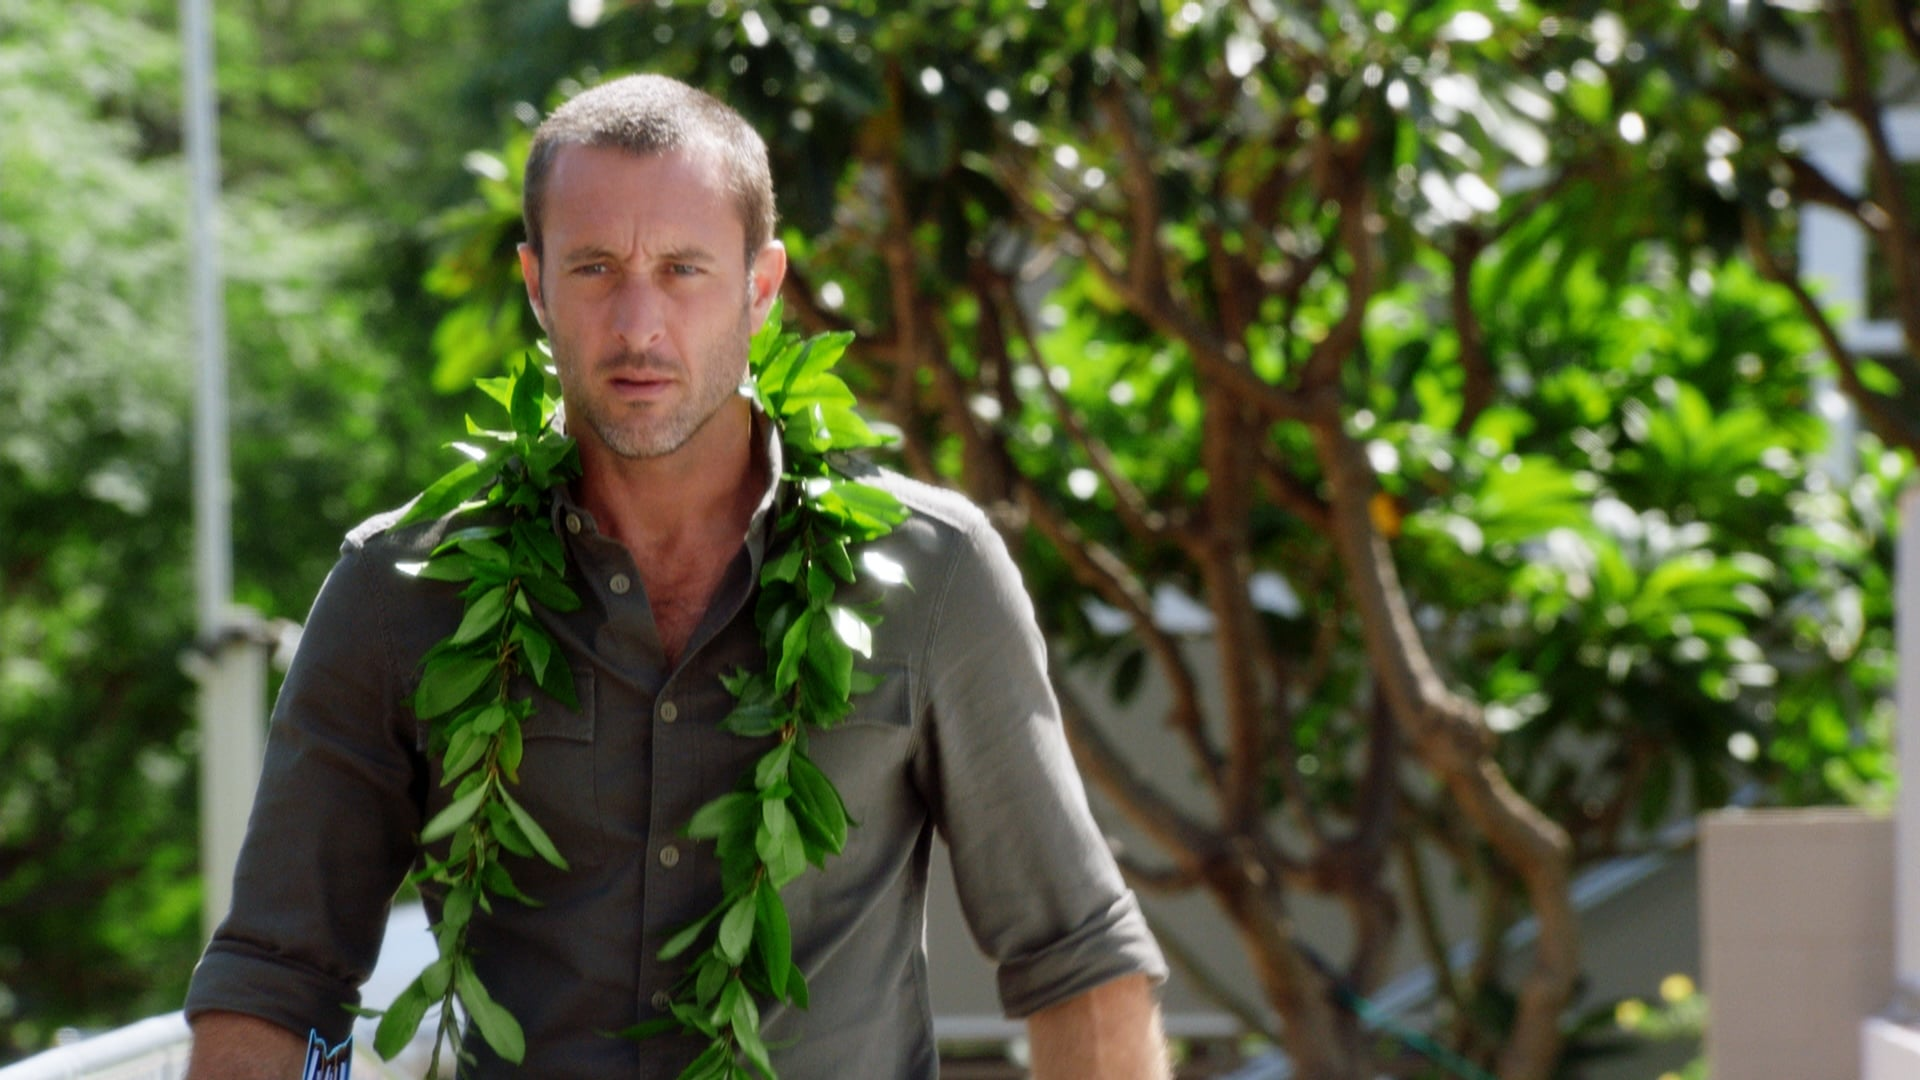 Hawaii Five-0 - Season 8 Episode 19 : Aohe mea make i ka hewa; make no i ka mihi ole (No One Has Ever Died For the Mistakes He Has Made; Only Because He Didn't Repent)